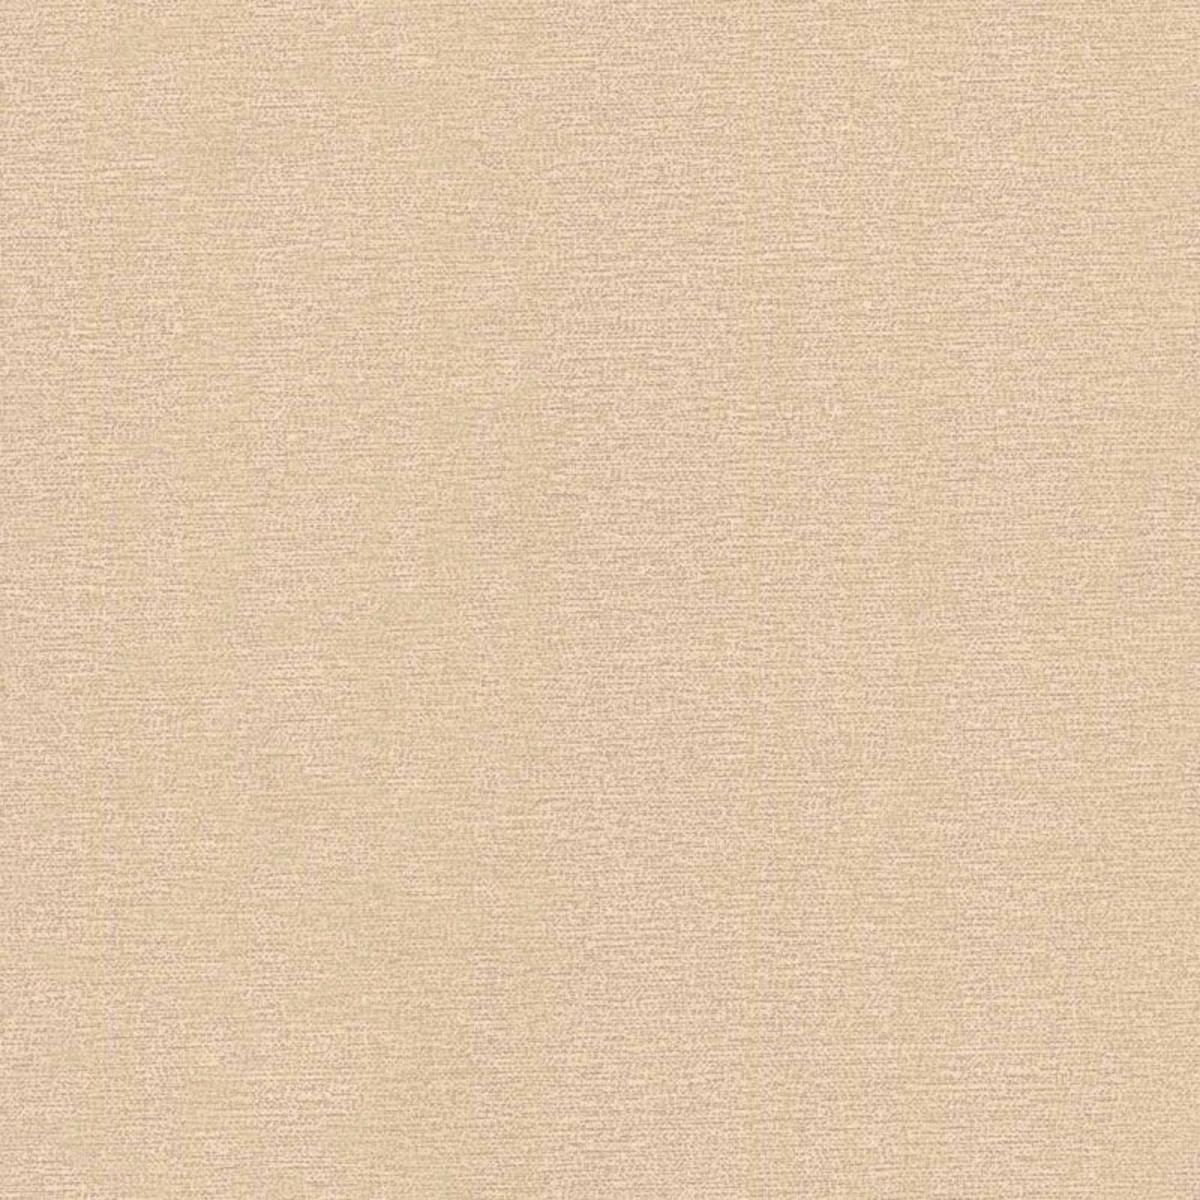 Обои флизелиновые Артекс Freedom бежевые 1.06 м 10057-02